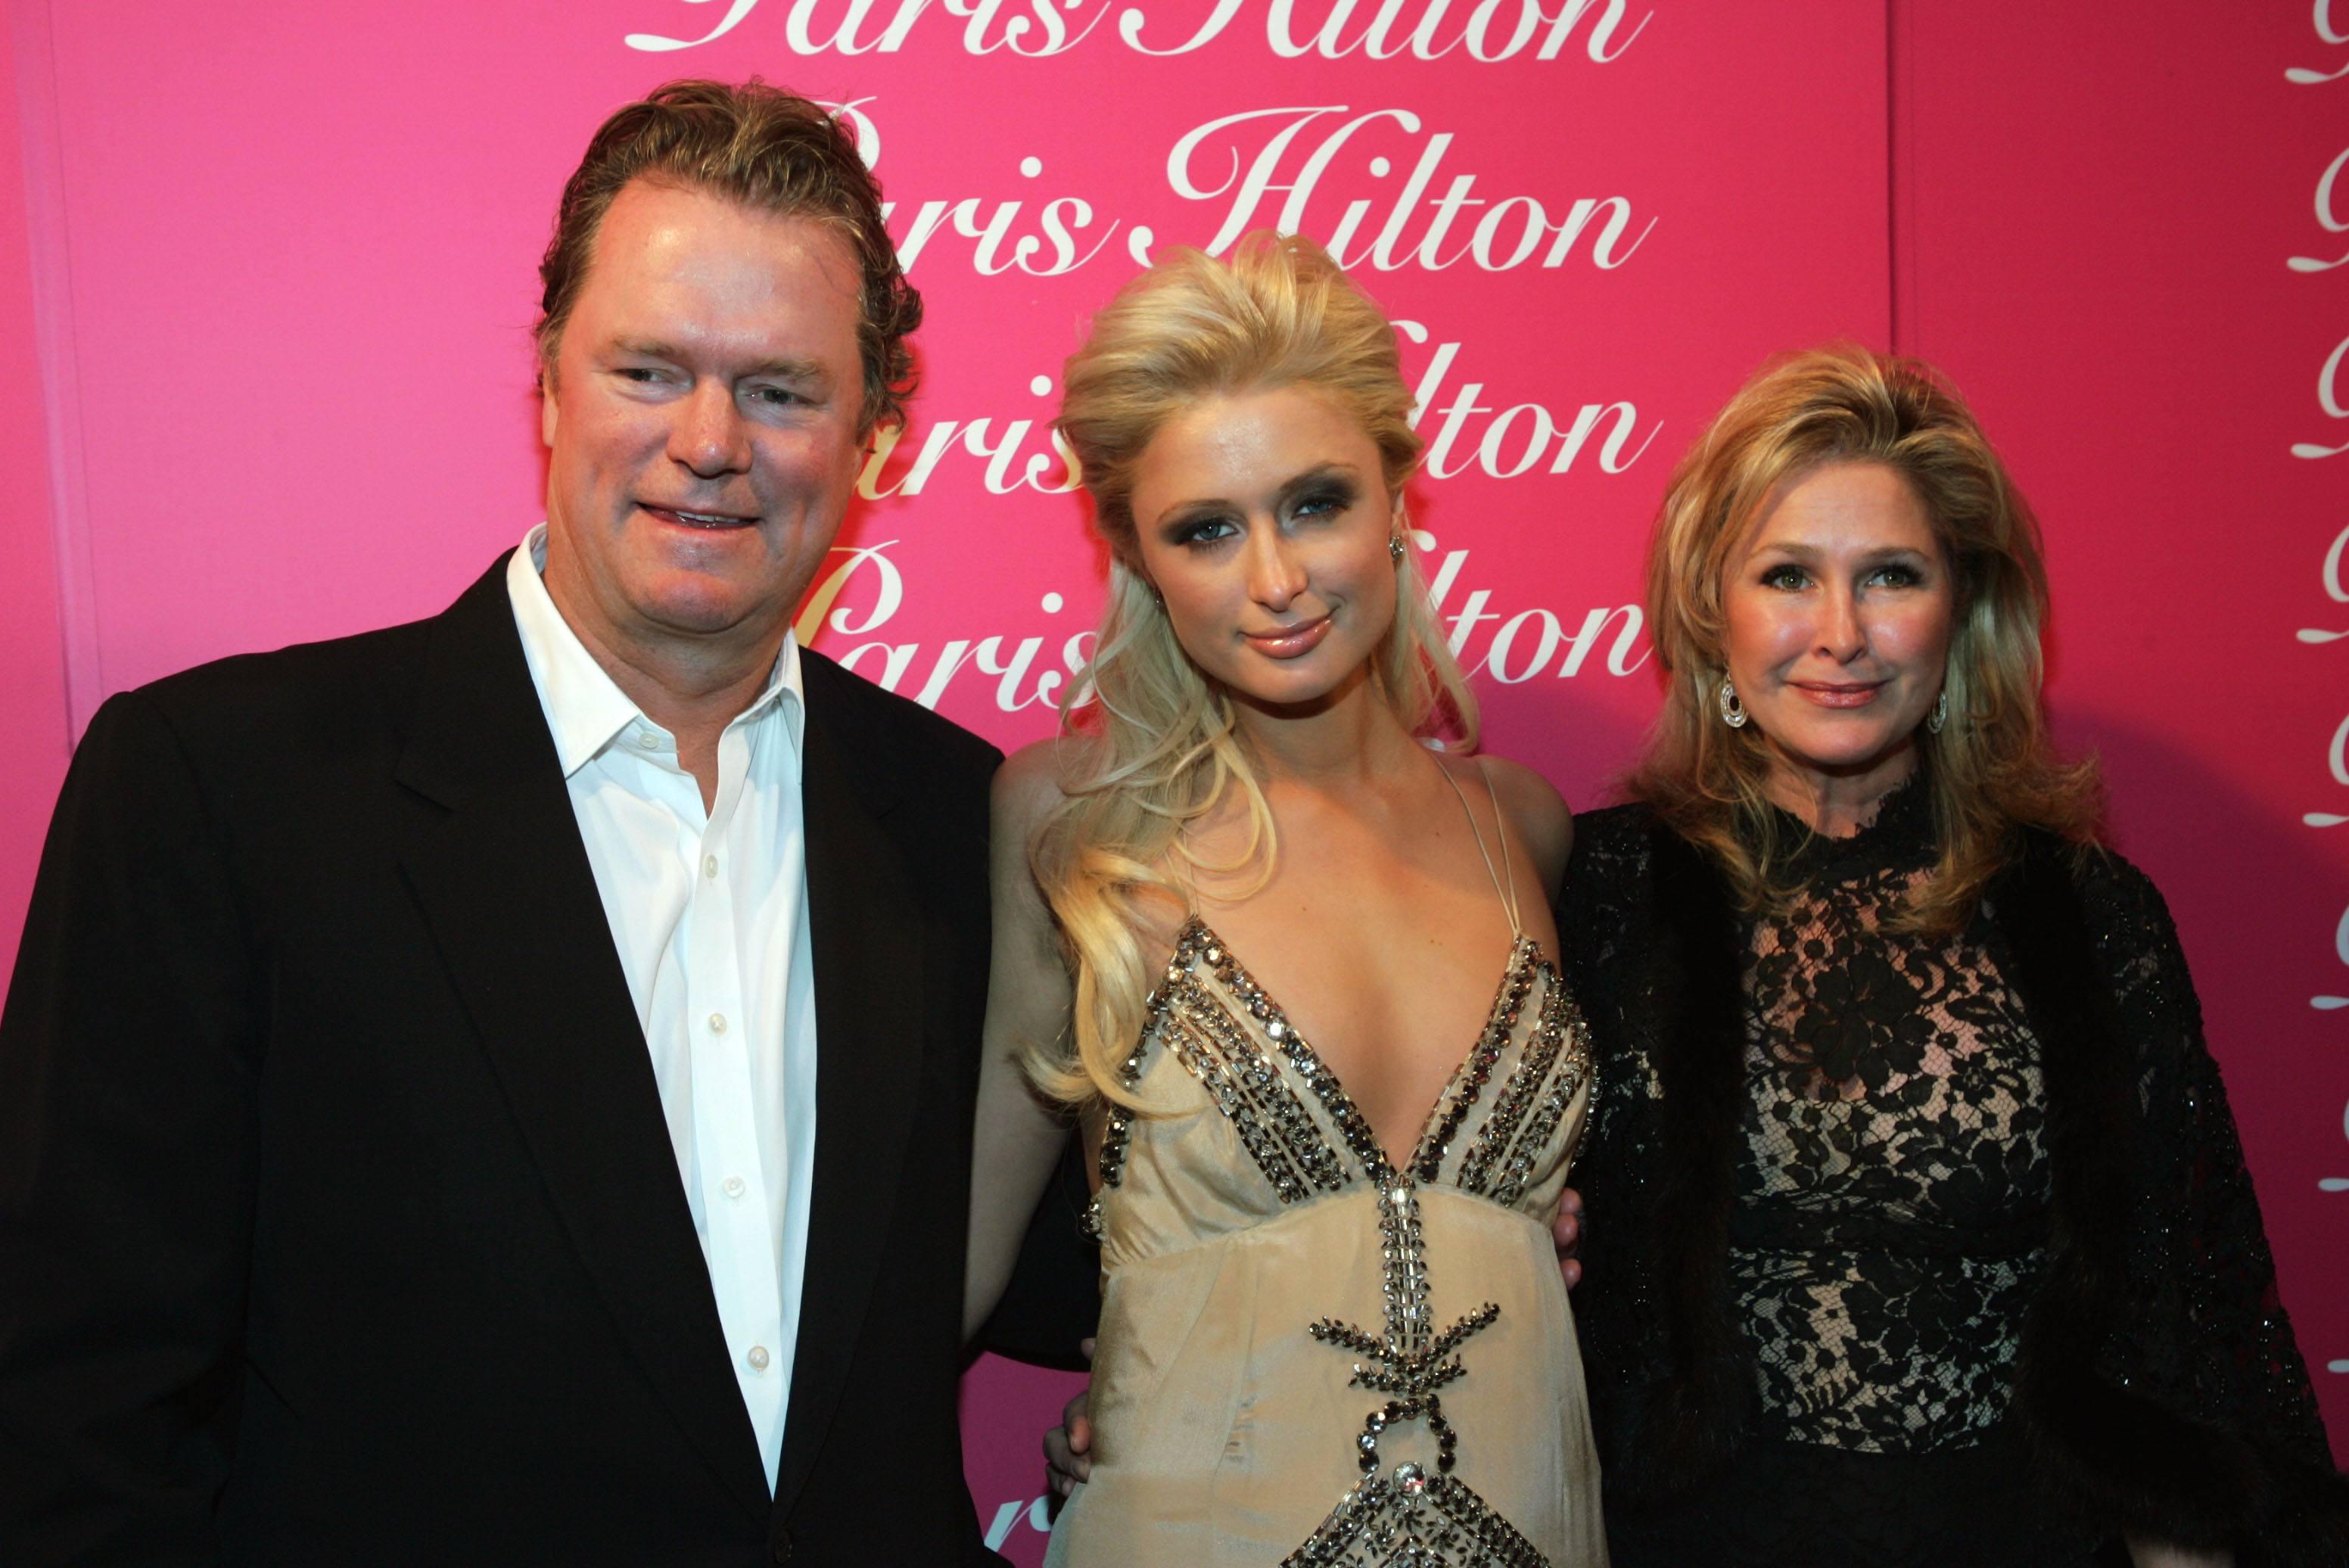 Paris Hilton with her parents Rick and Kathy